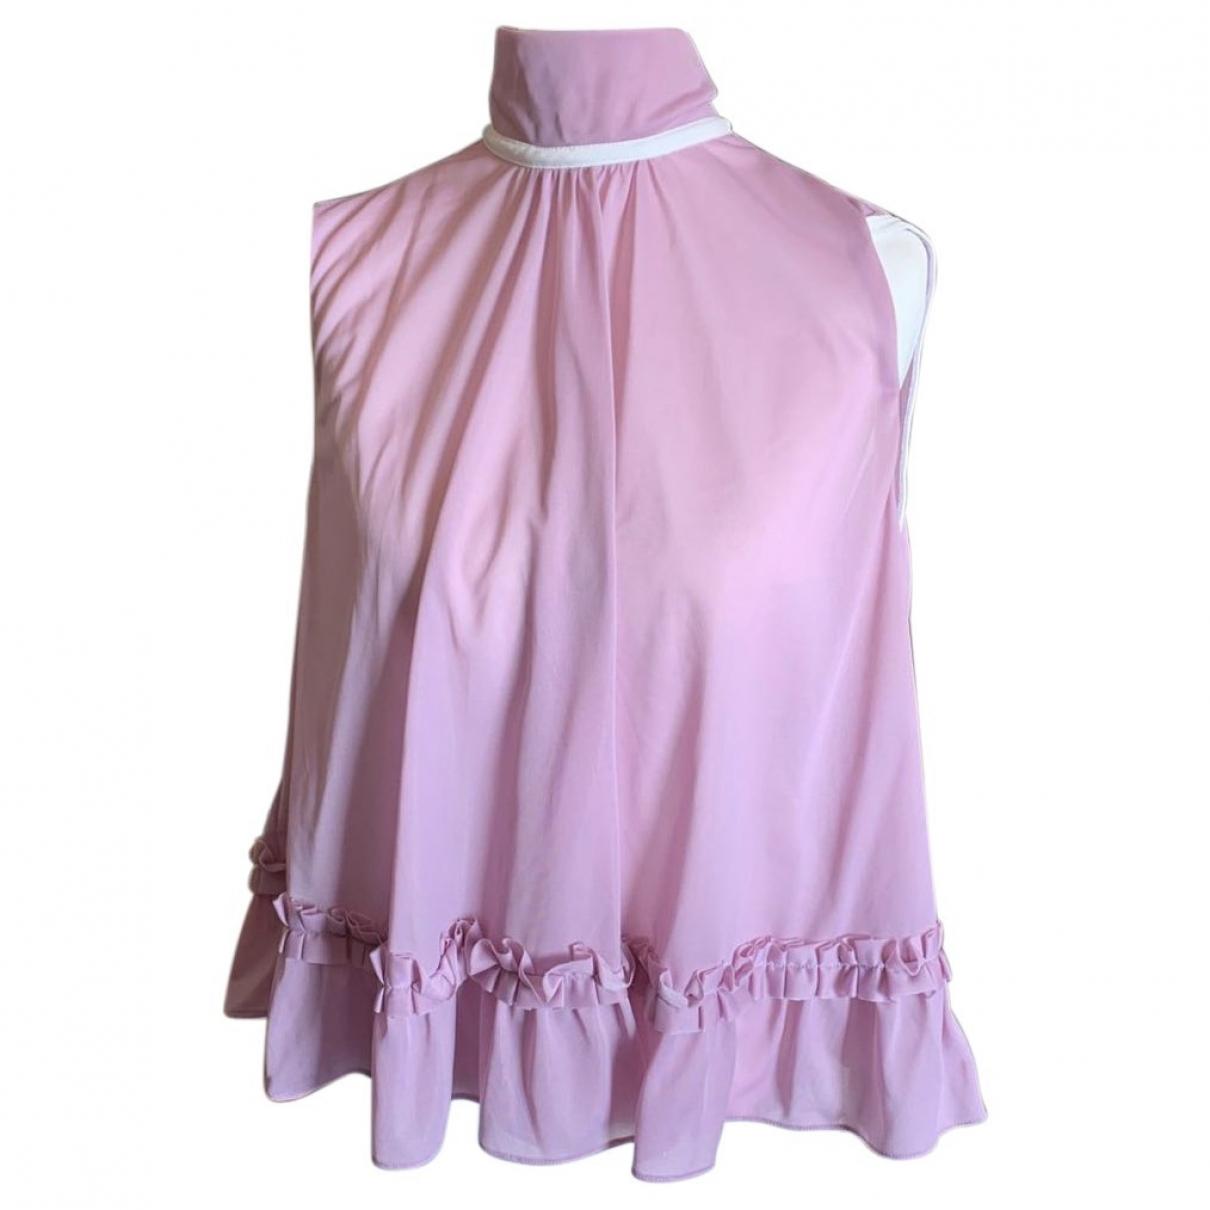 Miu Miu - Top   pour femme en coton - rose